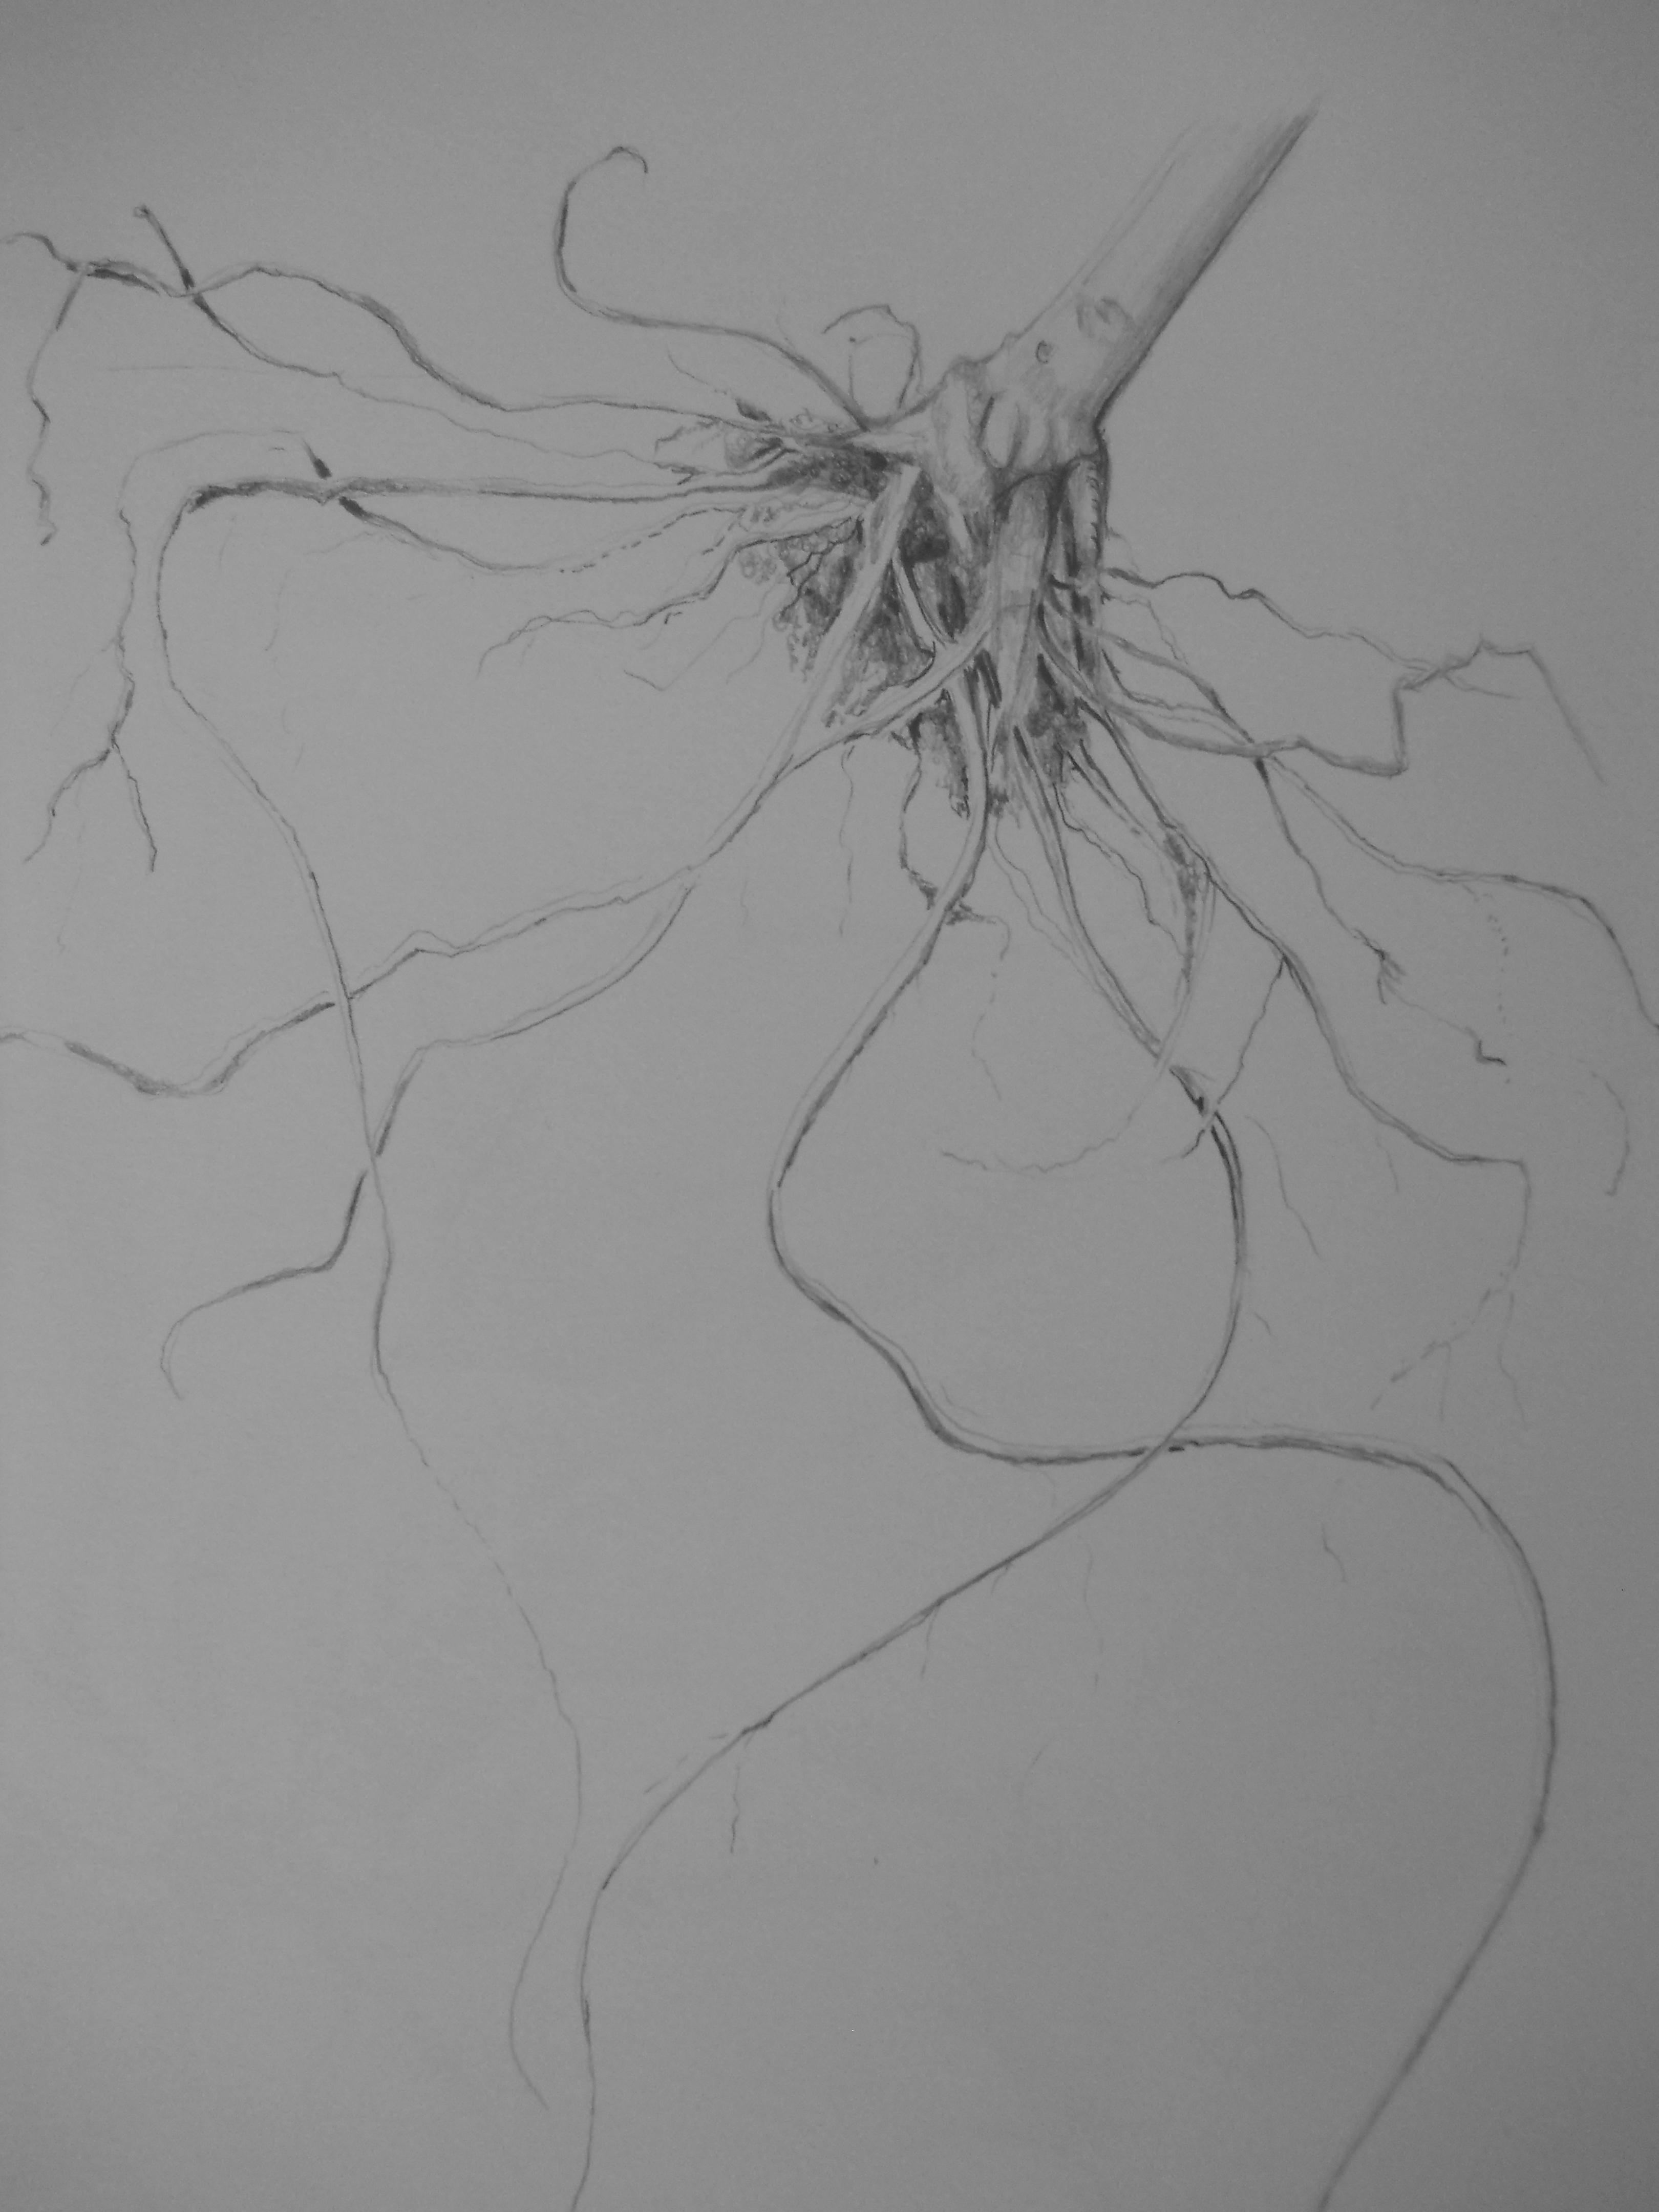 Botanical Illustration And The Slow Art Movement Lewis